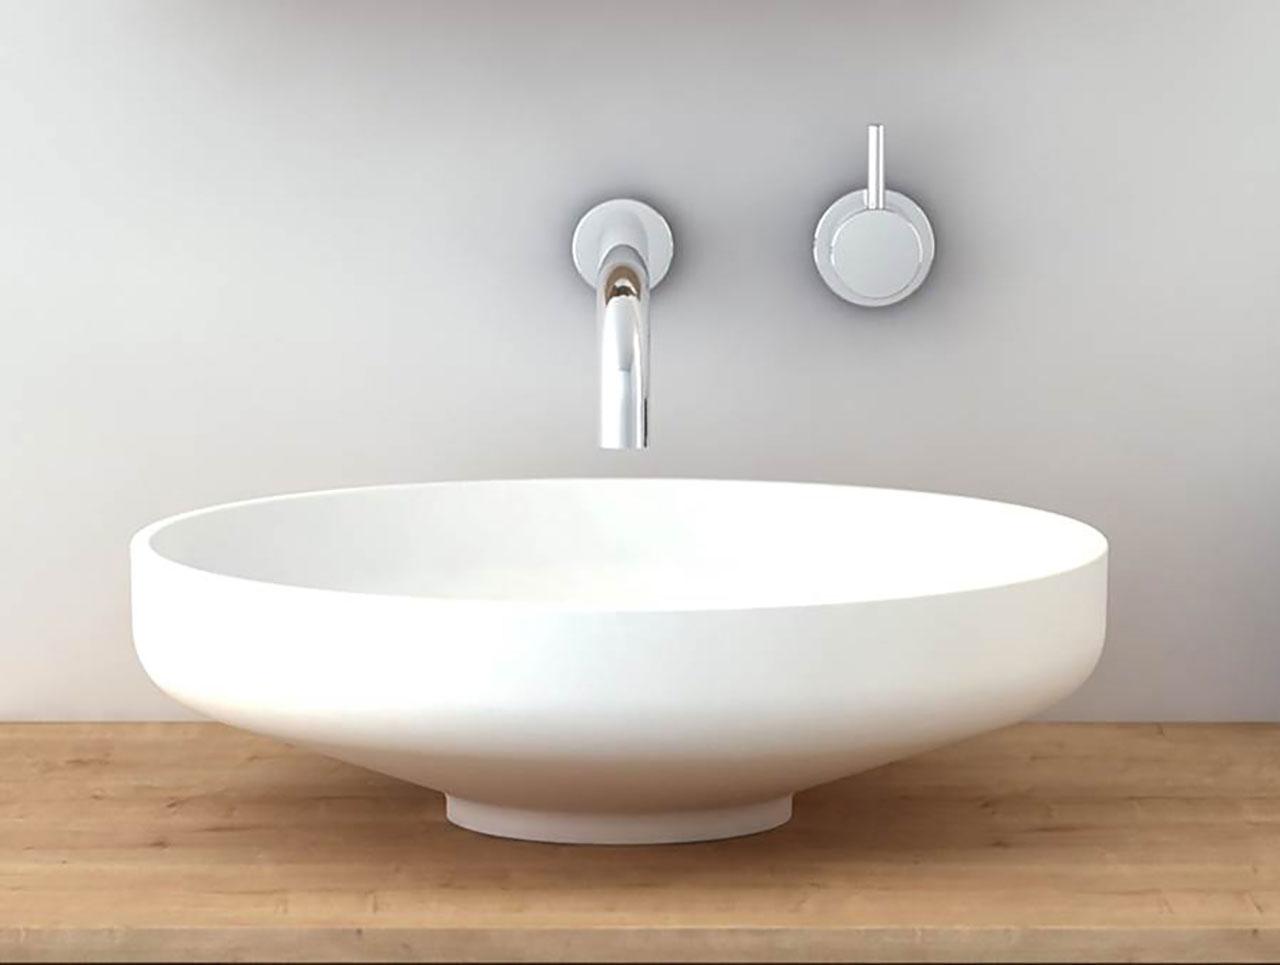 Top Mount Bathroom Sink Round